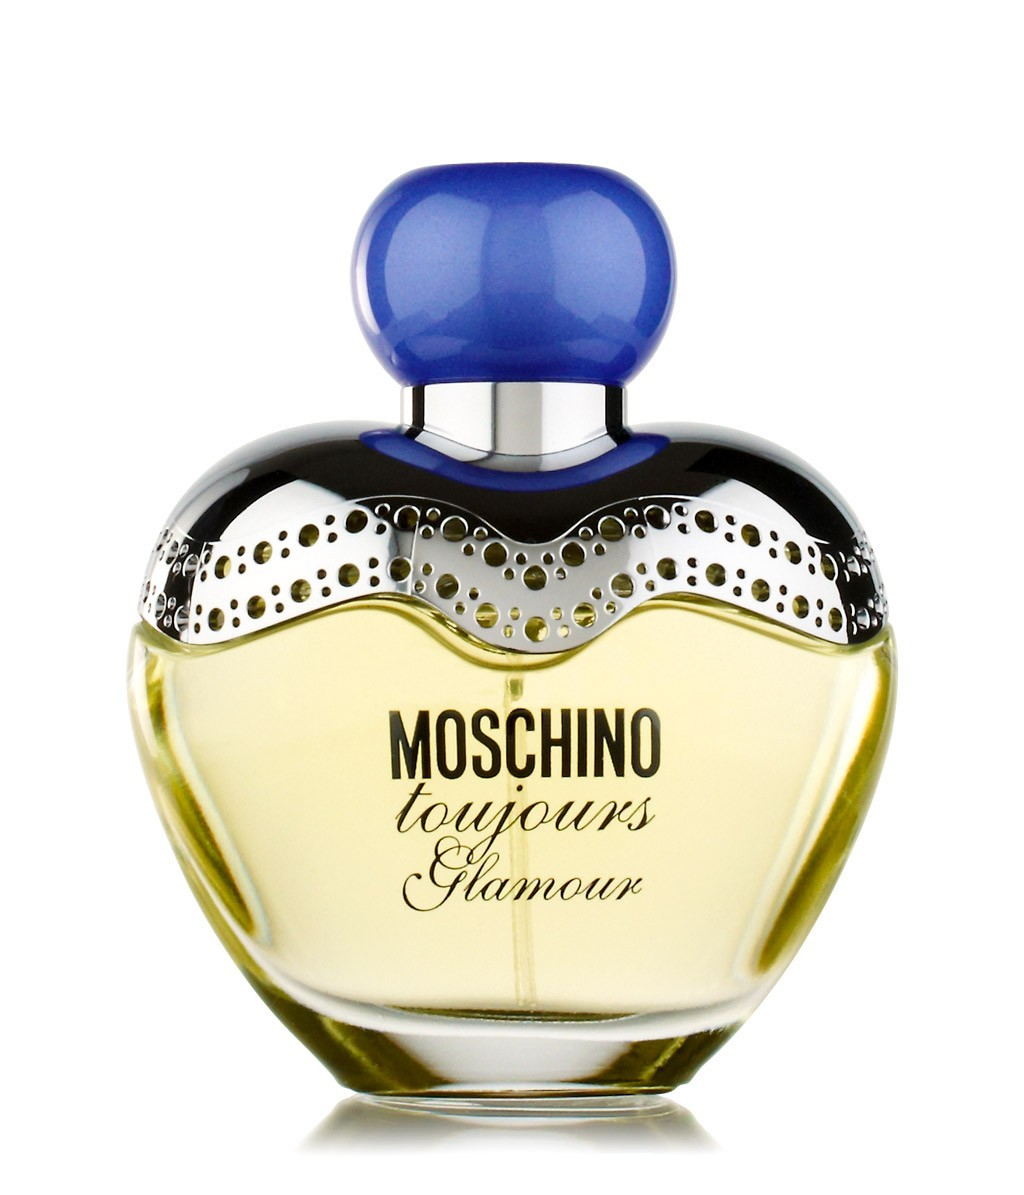 Moschino Toujours Glamour аромат для женщин